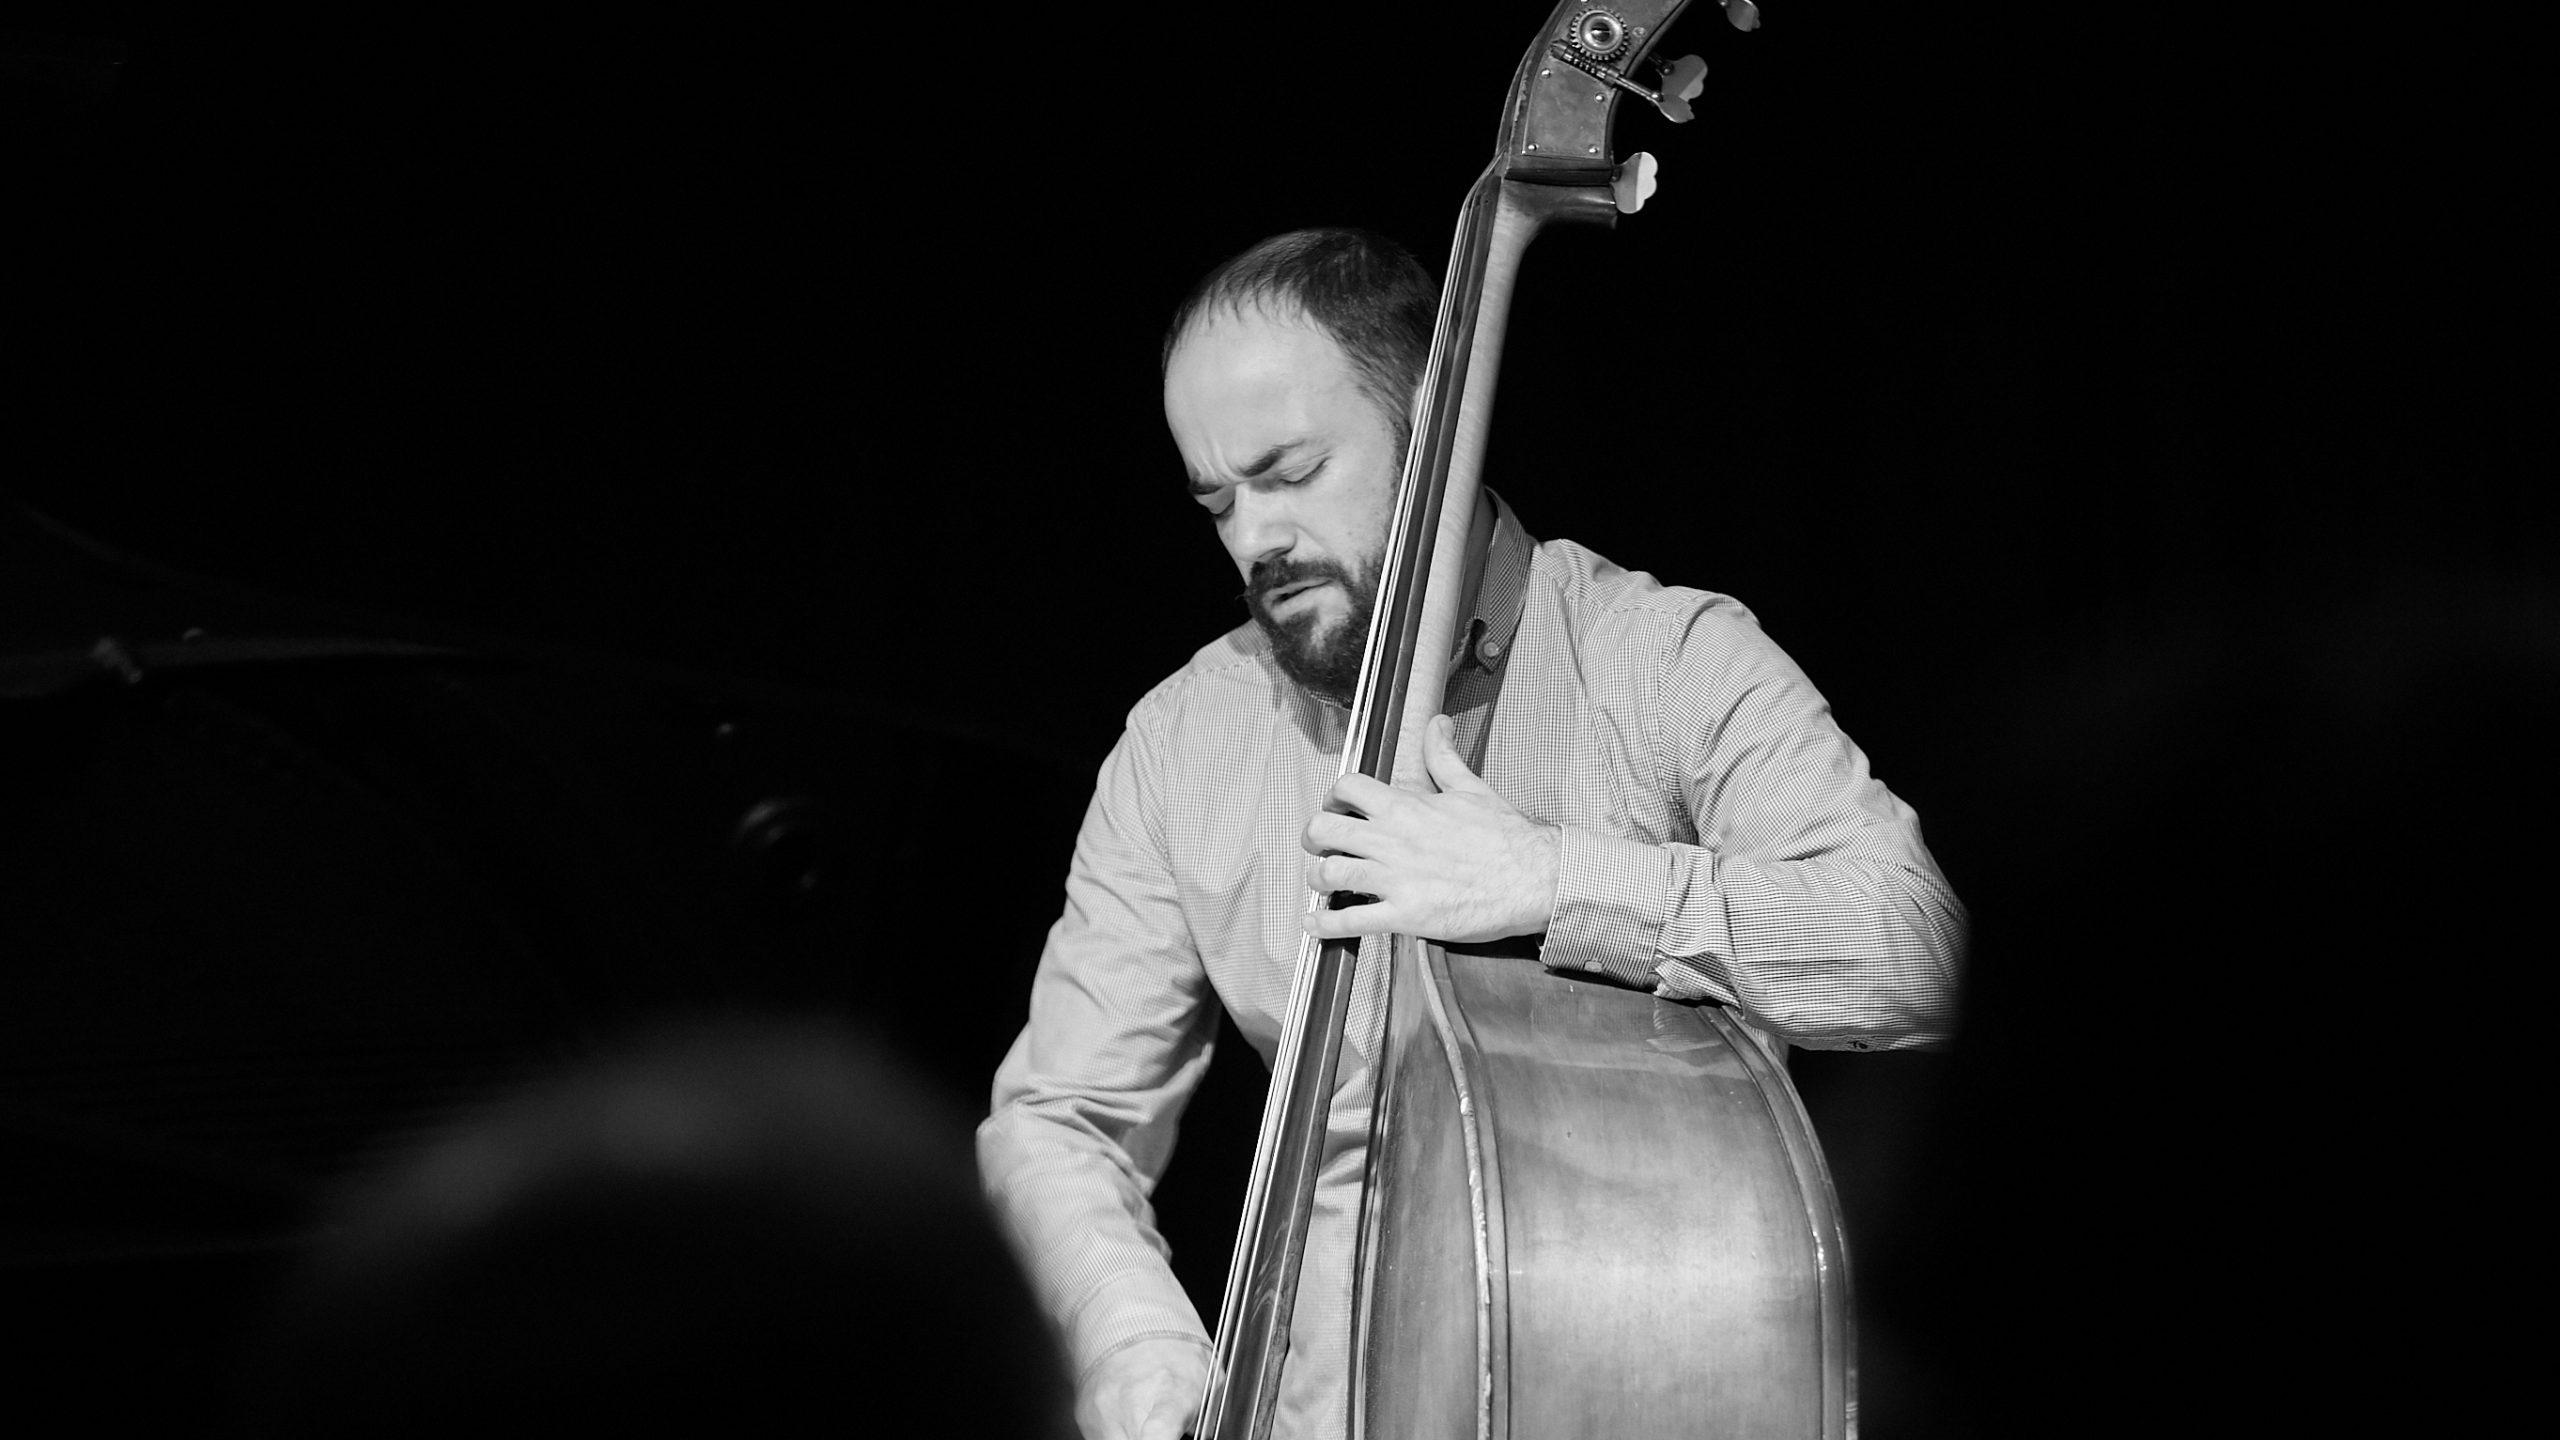 Kontrabass, Musiker, Jazz, Bassist